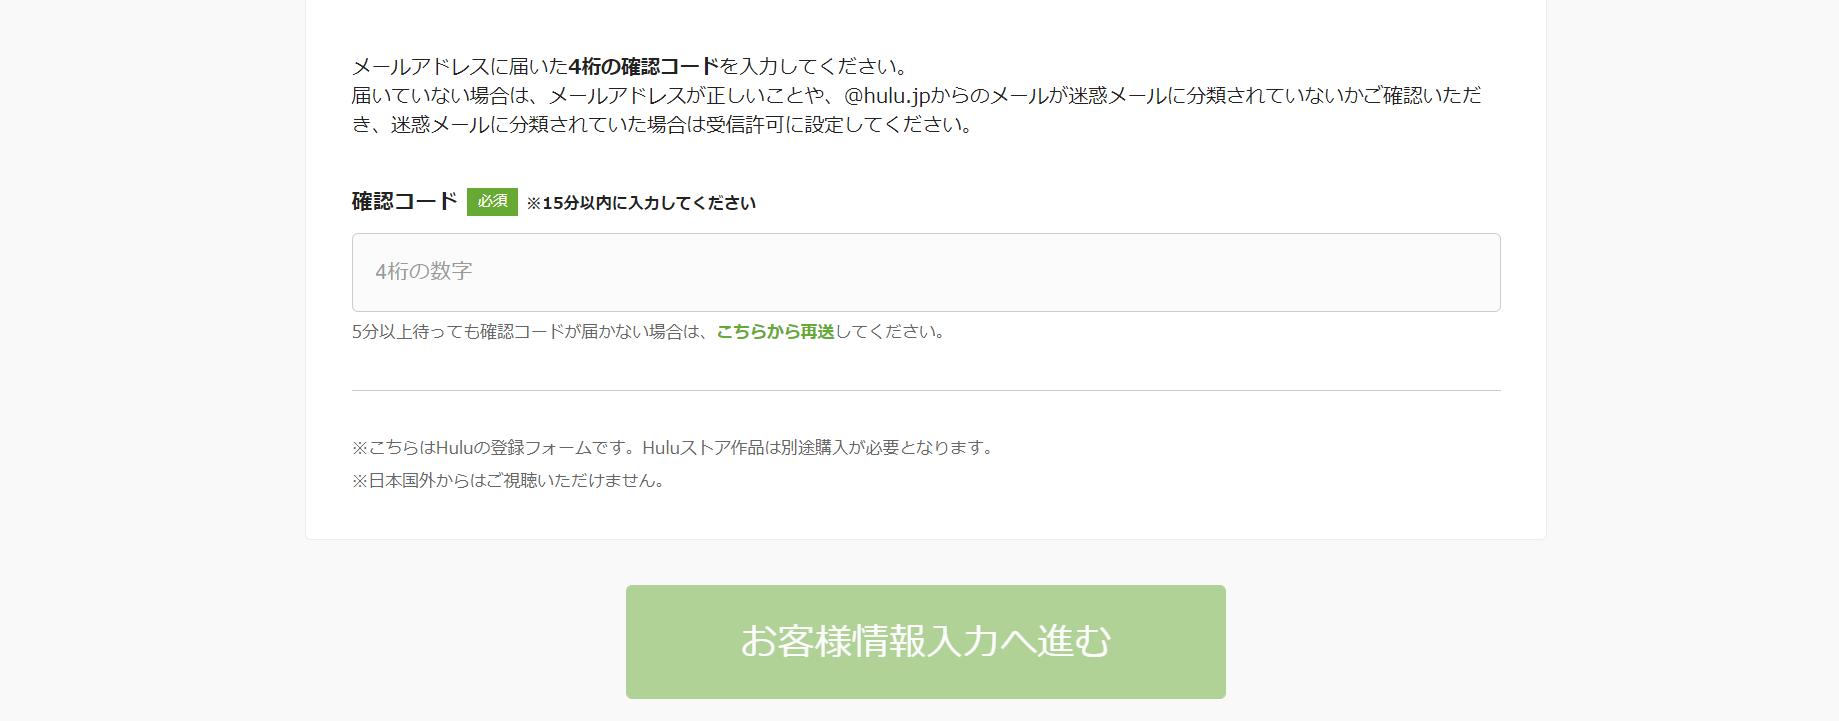 hulu_コードを送信